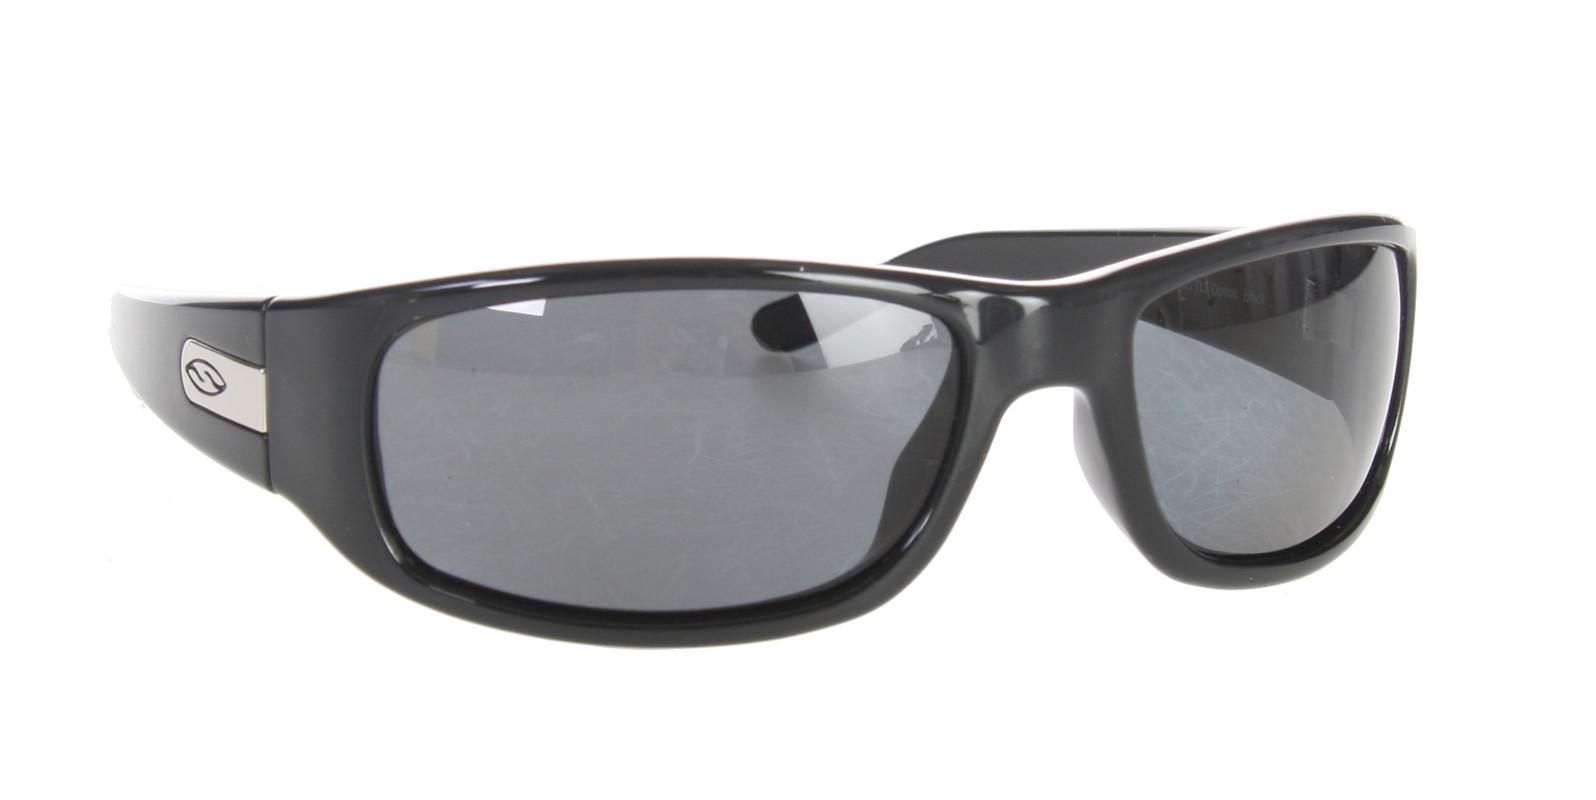 Smith Projekt Sunglasses Black Polarized  smith-projekt-sngls-blkpolar-09.jpg